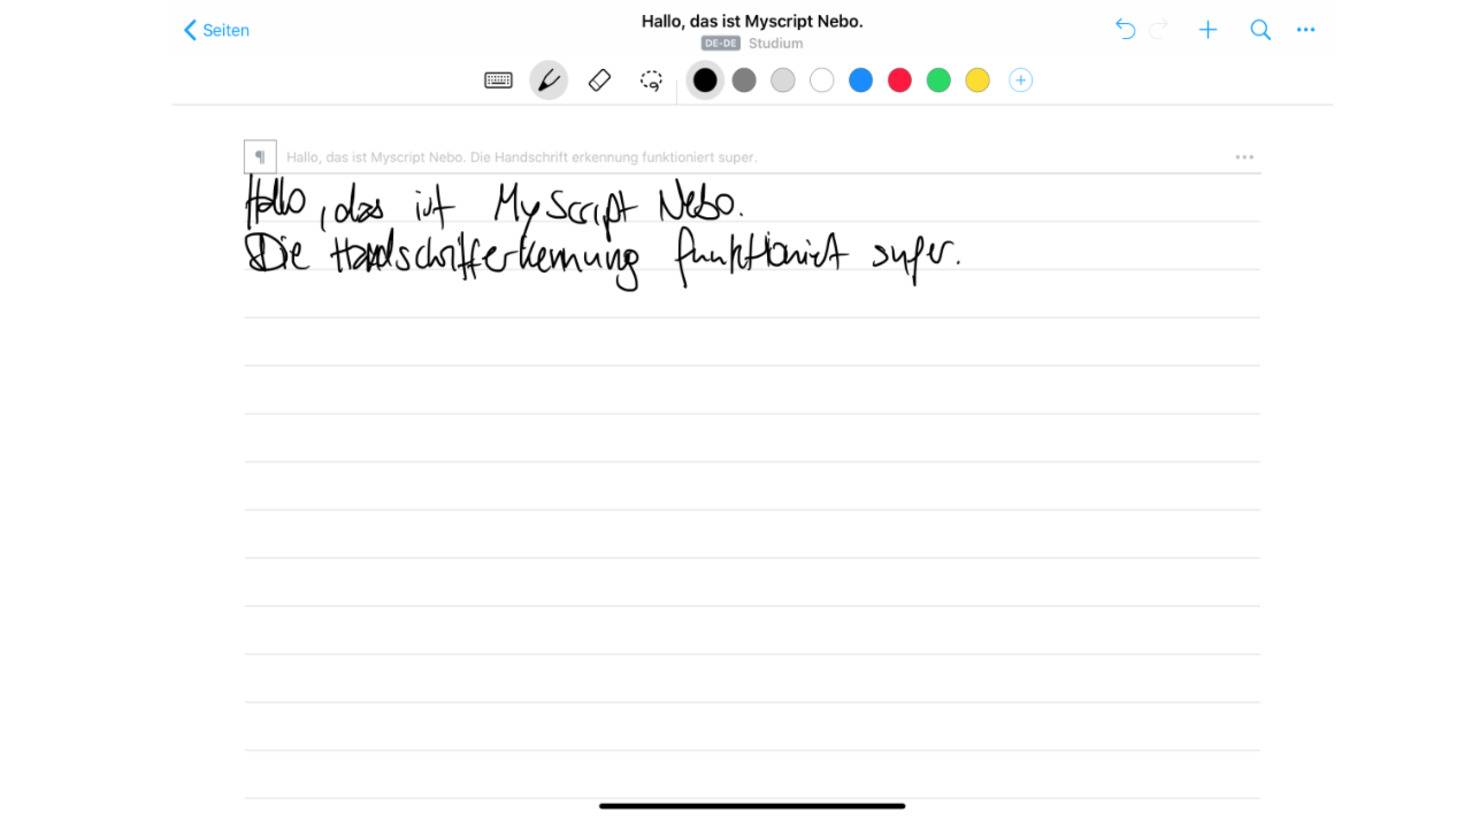 My Script Nebo